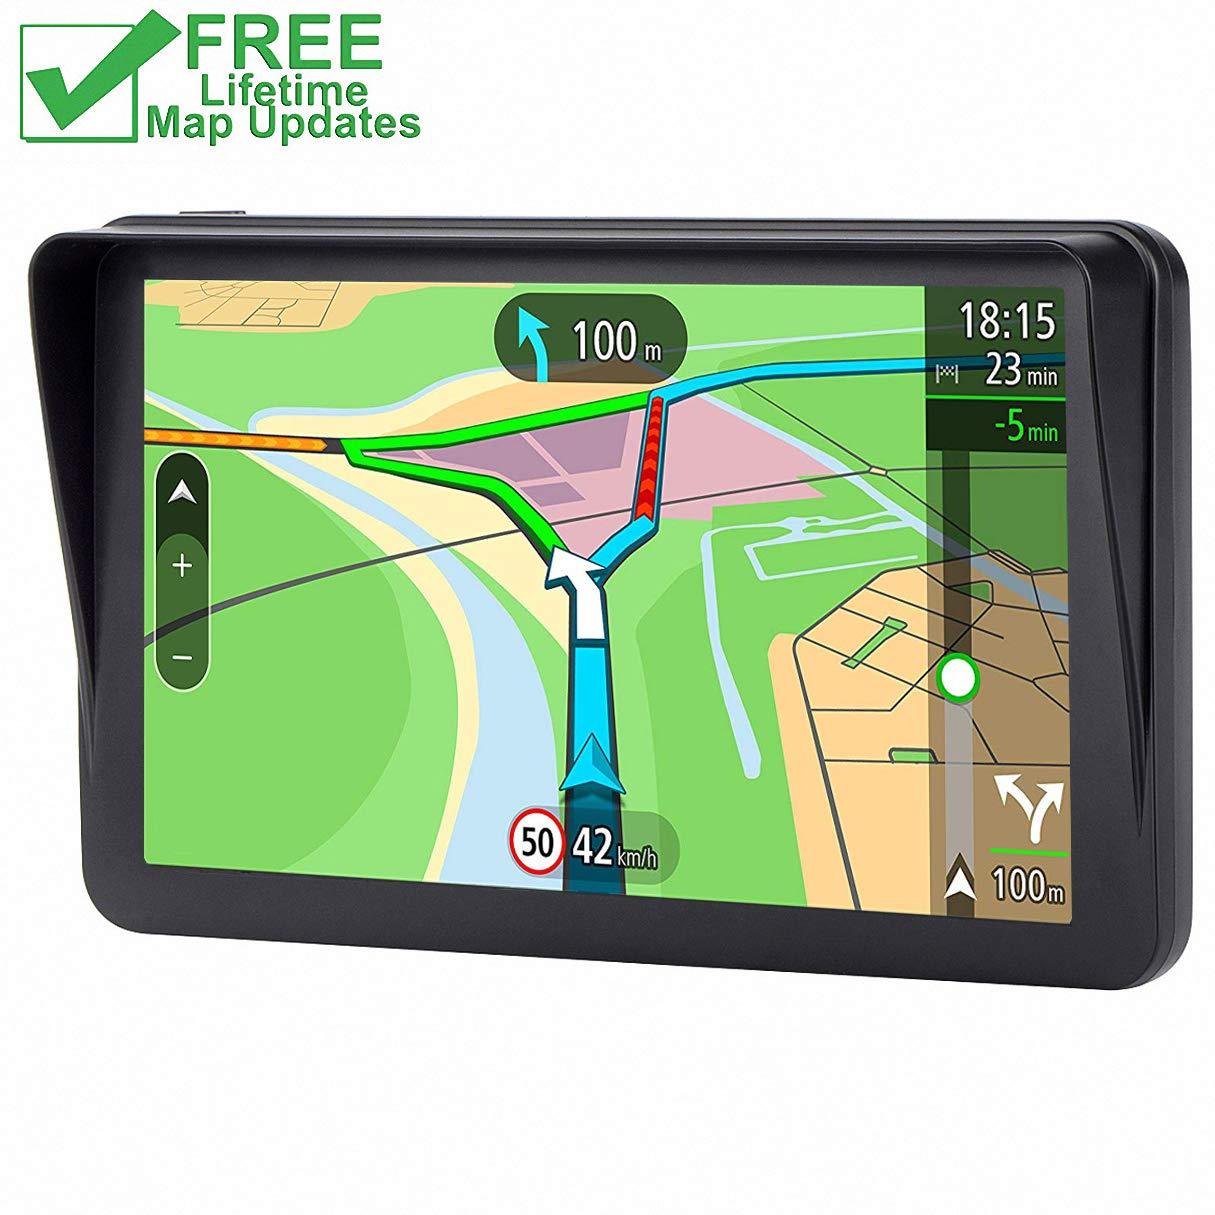 GPS for Car Vehicle GPS Navigator 7 inches SAT NAV Lifetime Map Update Spoken Turn-to-turn Navigation System for Cars